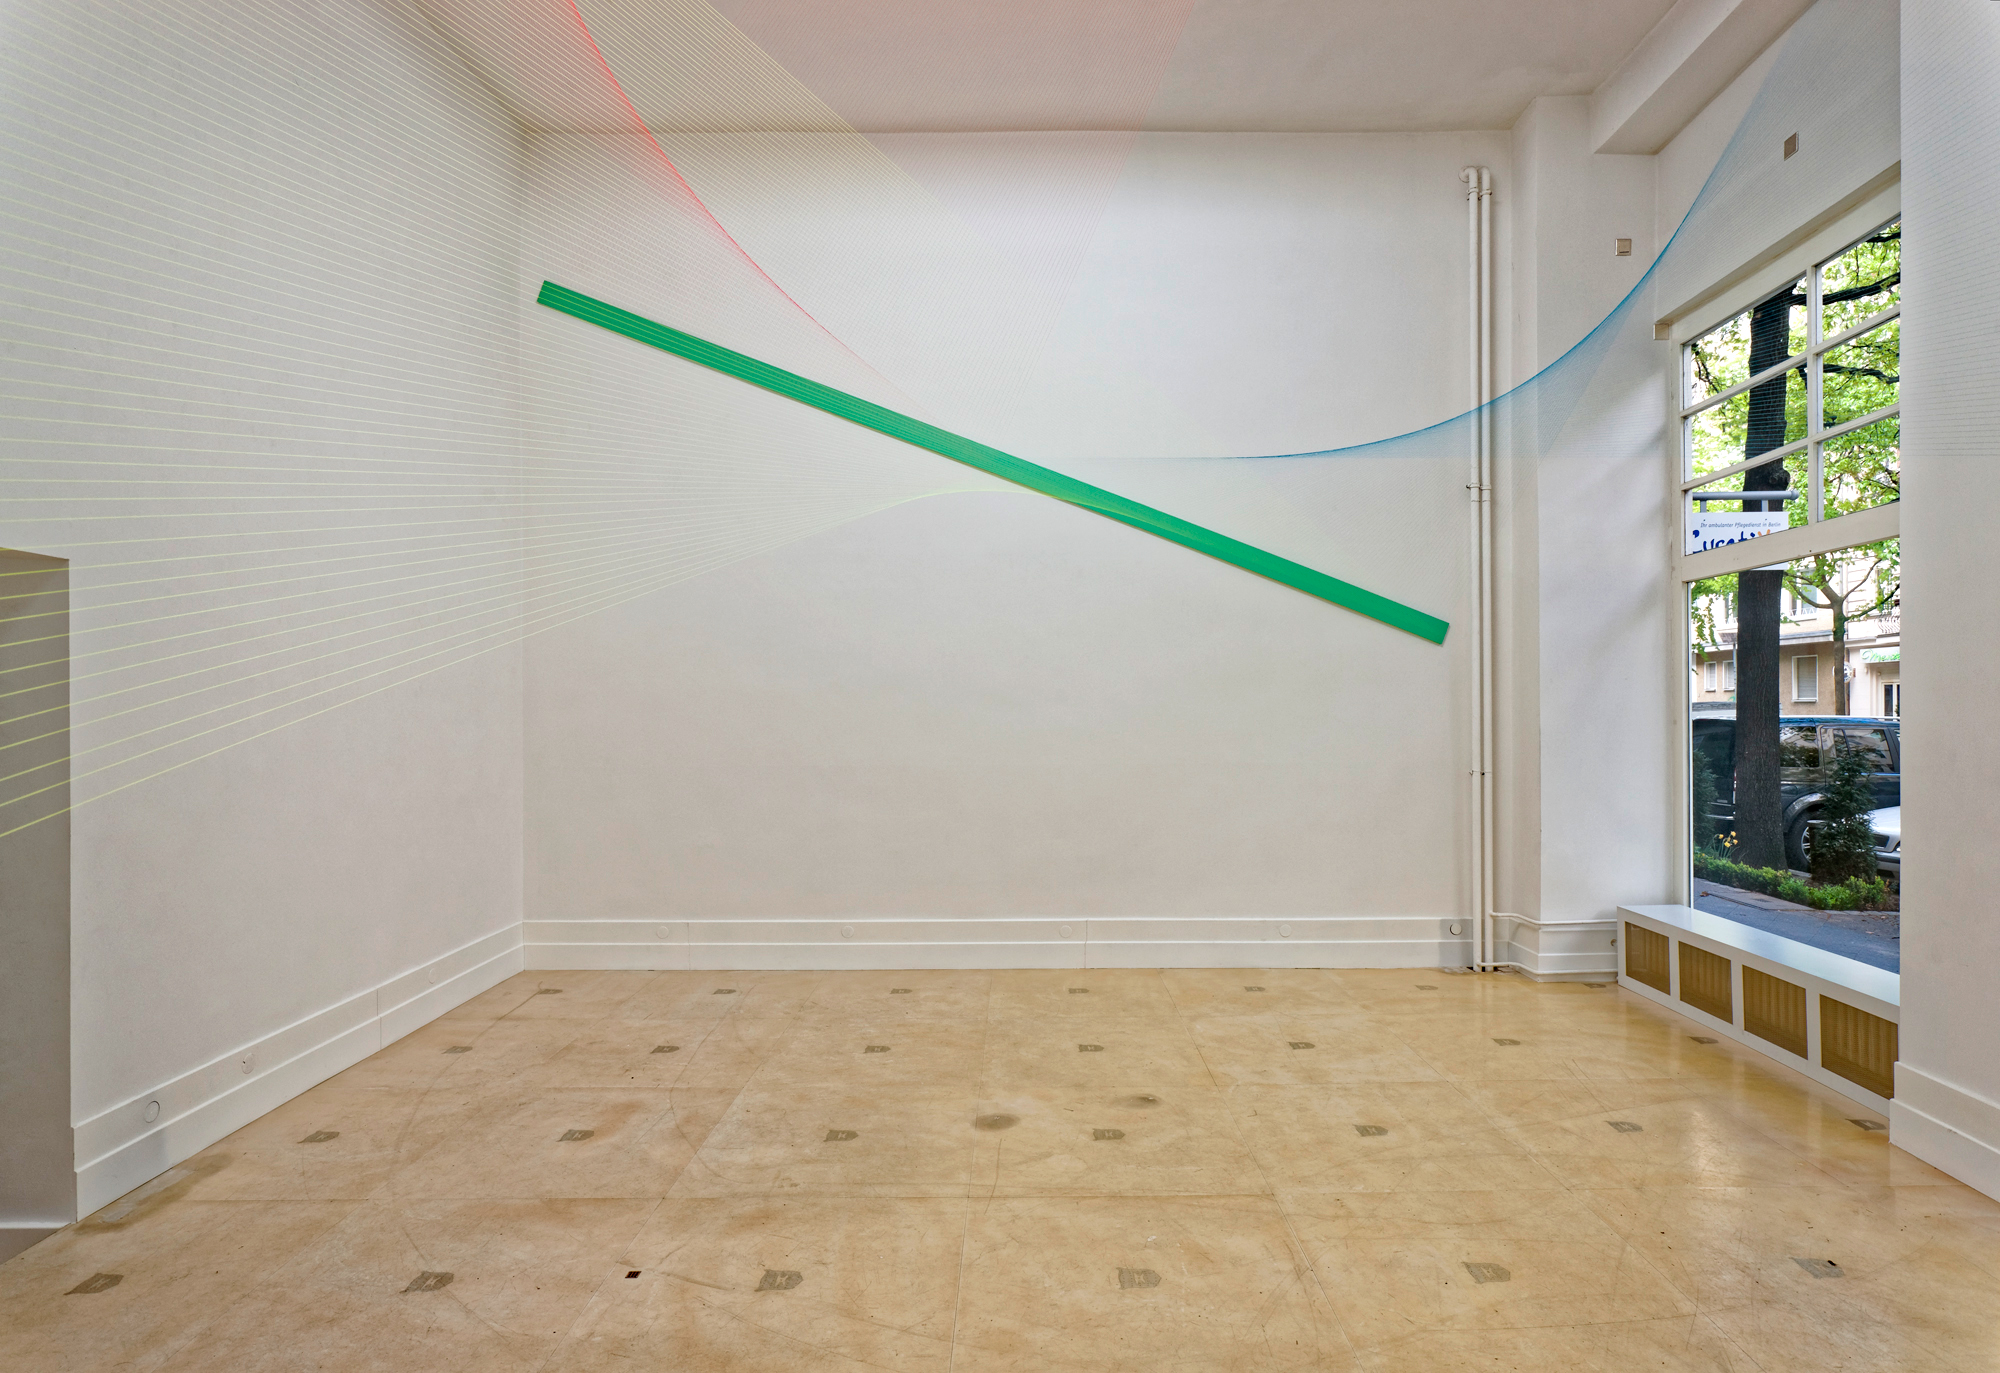 Kate-Terry-Thread-Installation-42_a.jpg